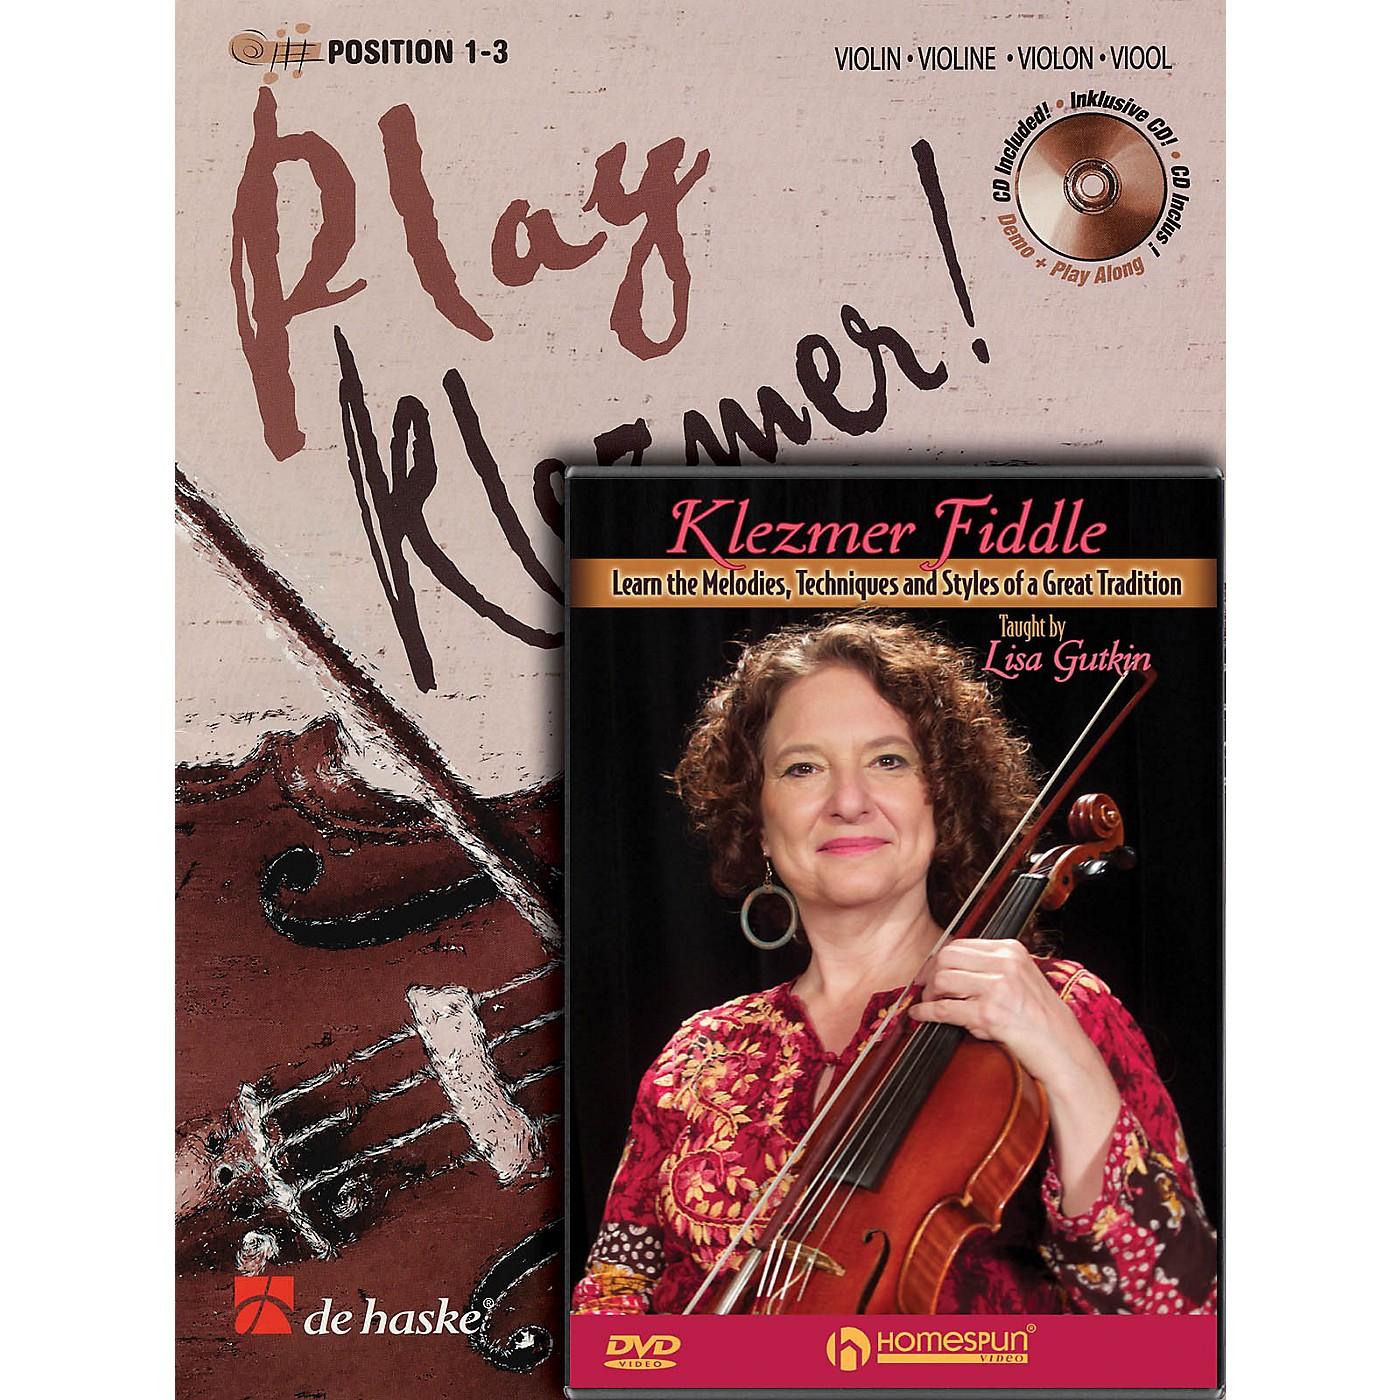 Homespun Play Klezmer - Violin/Fiddle Bundle Pack Homespun Tapes Series Performed by Lisa Gutkin thumbnail